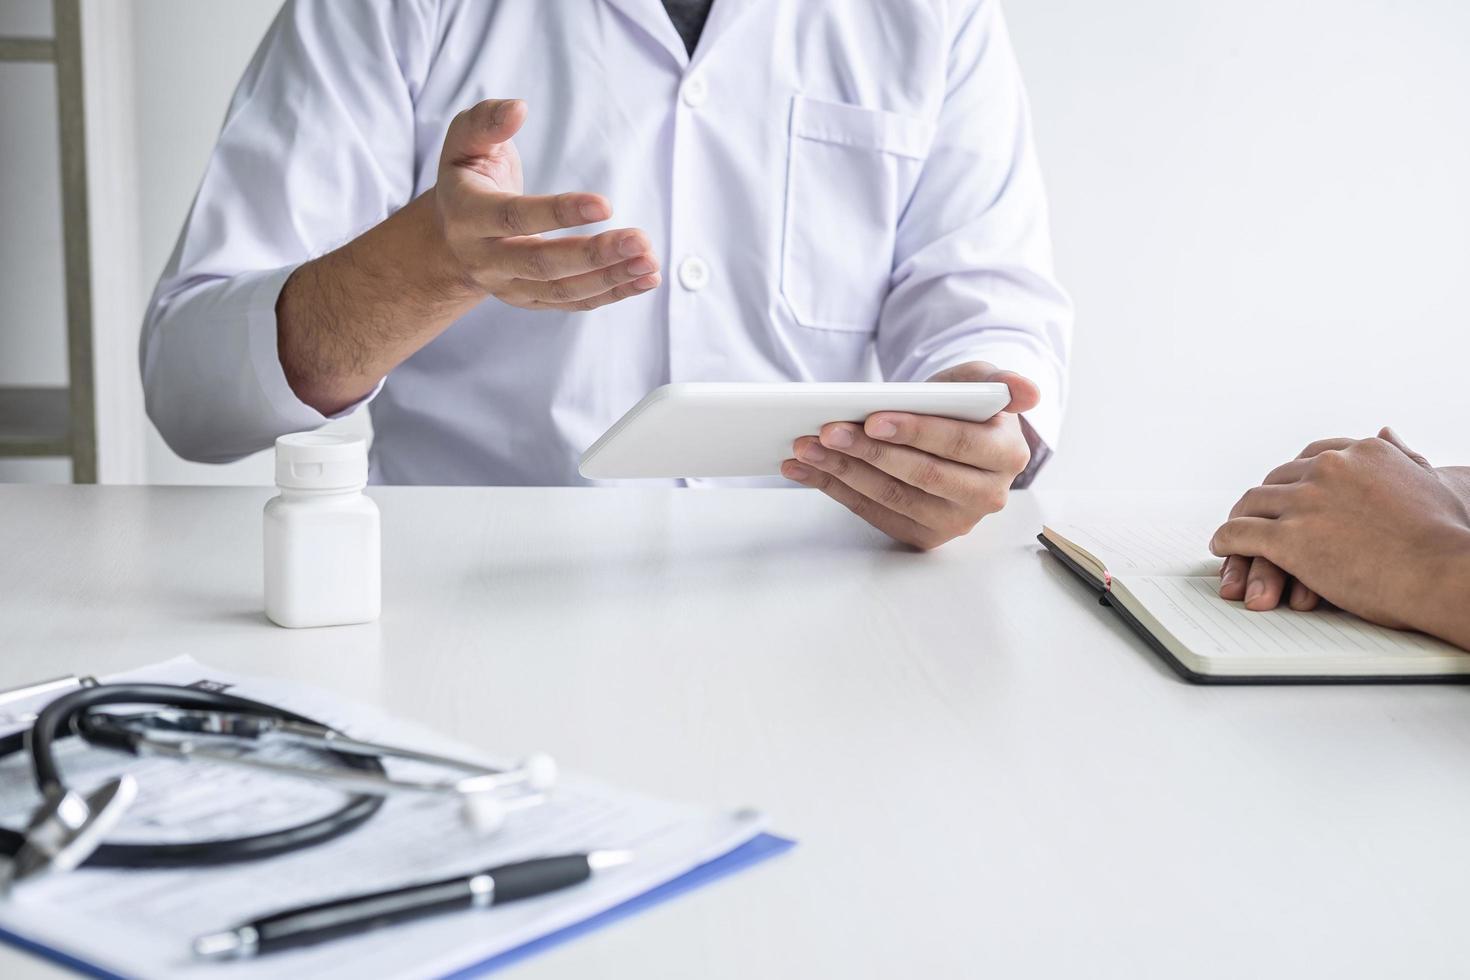 A doctor is prescribing healthcare to a patient  photo